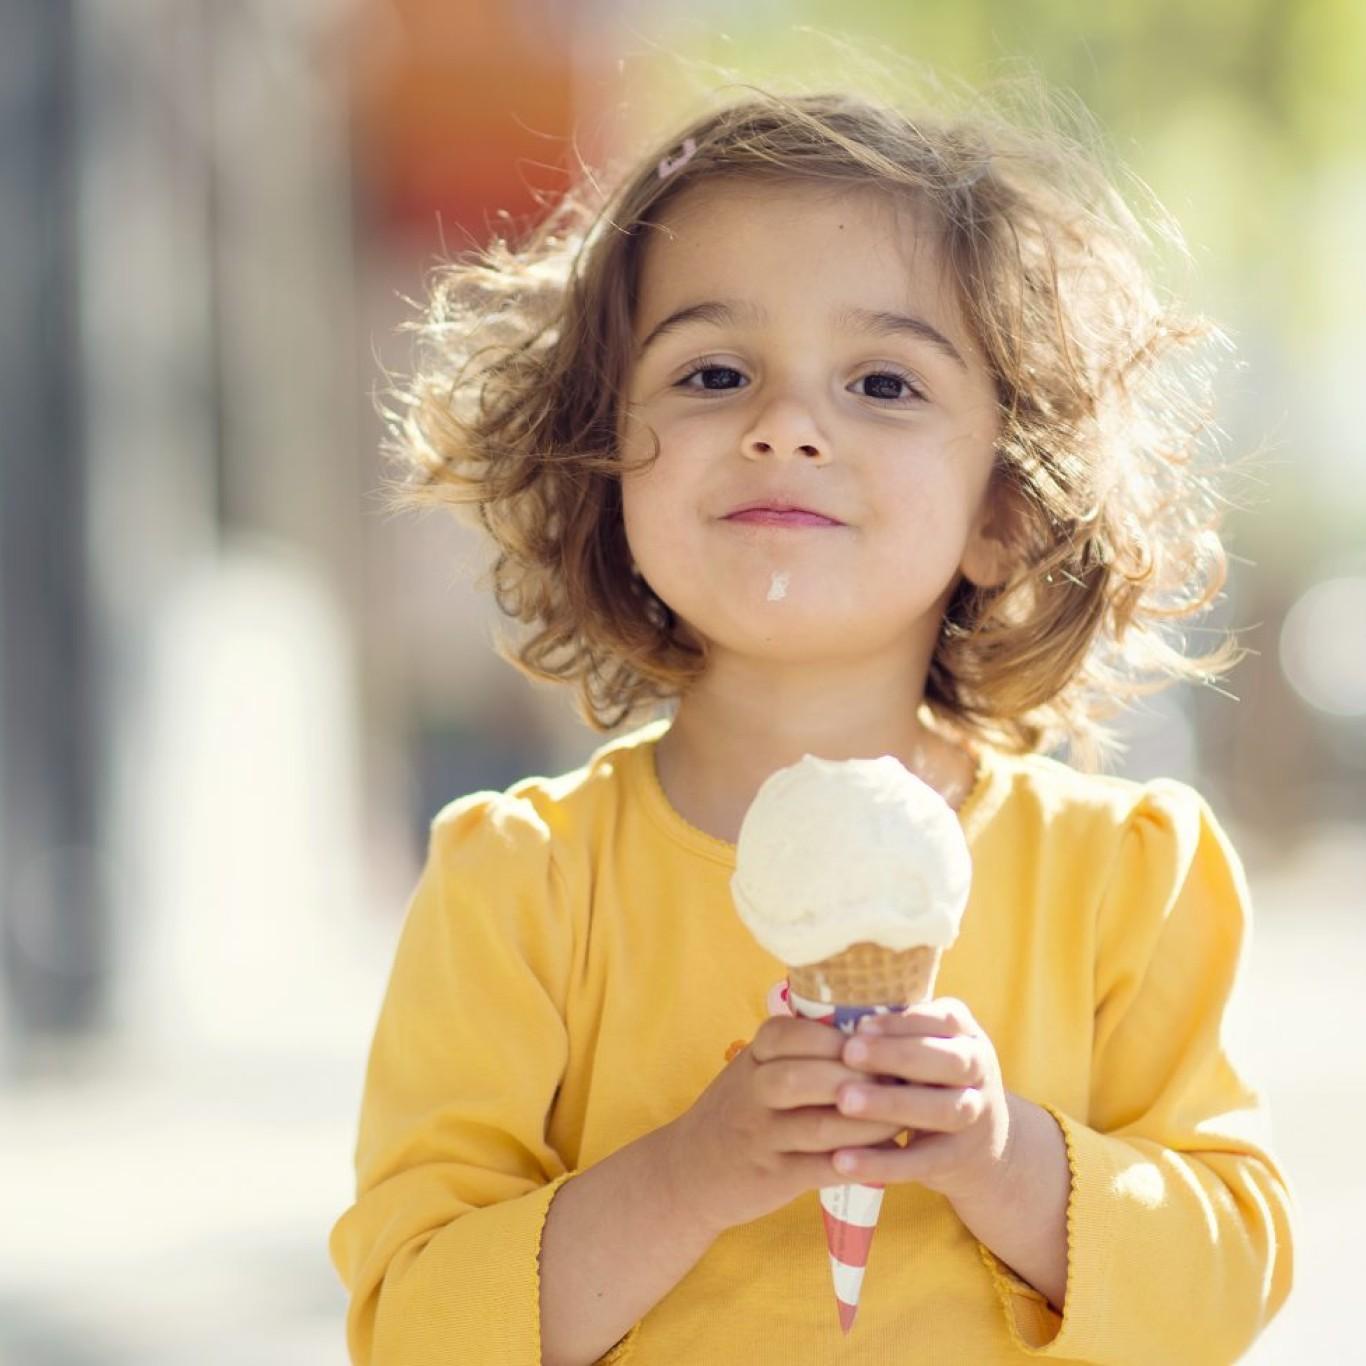 Child-eating-ice-cream